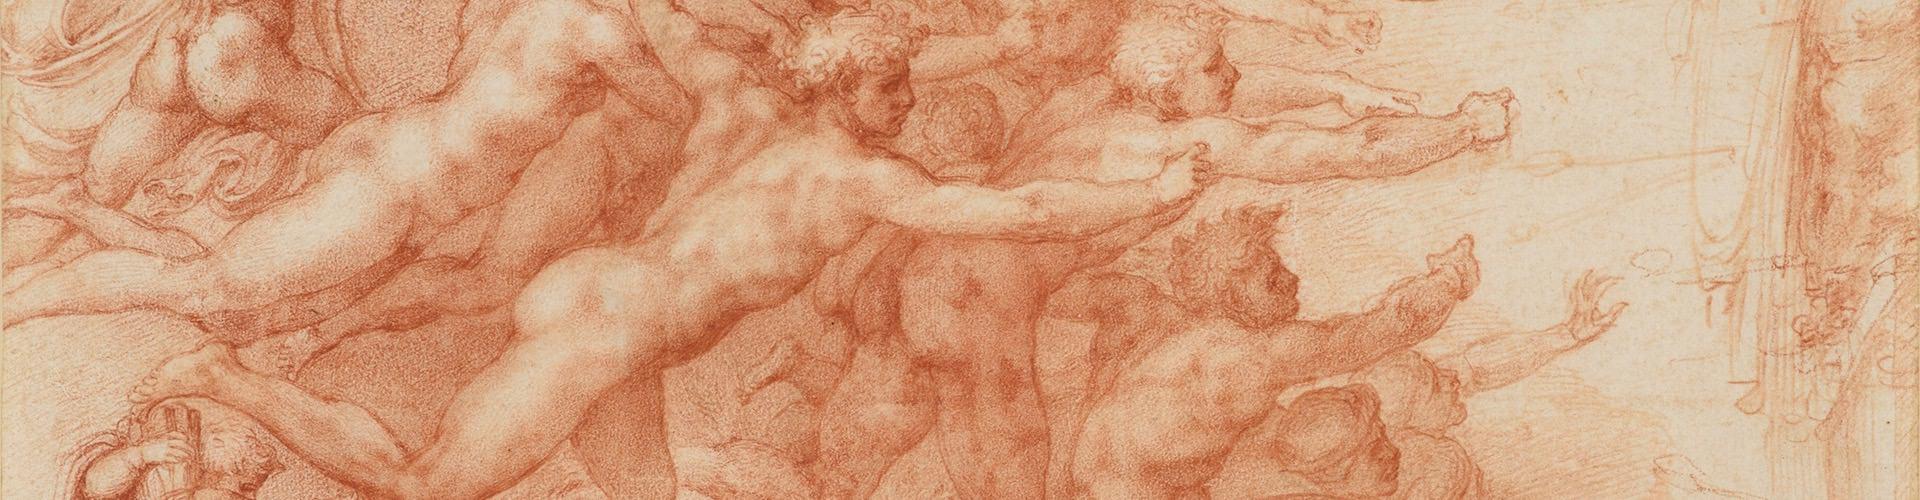 10.-Michelangelo_Archers-Shooting-at-a-Herm_HM-Queen-Elizabeth-II_Windsor-copy-1